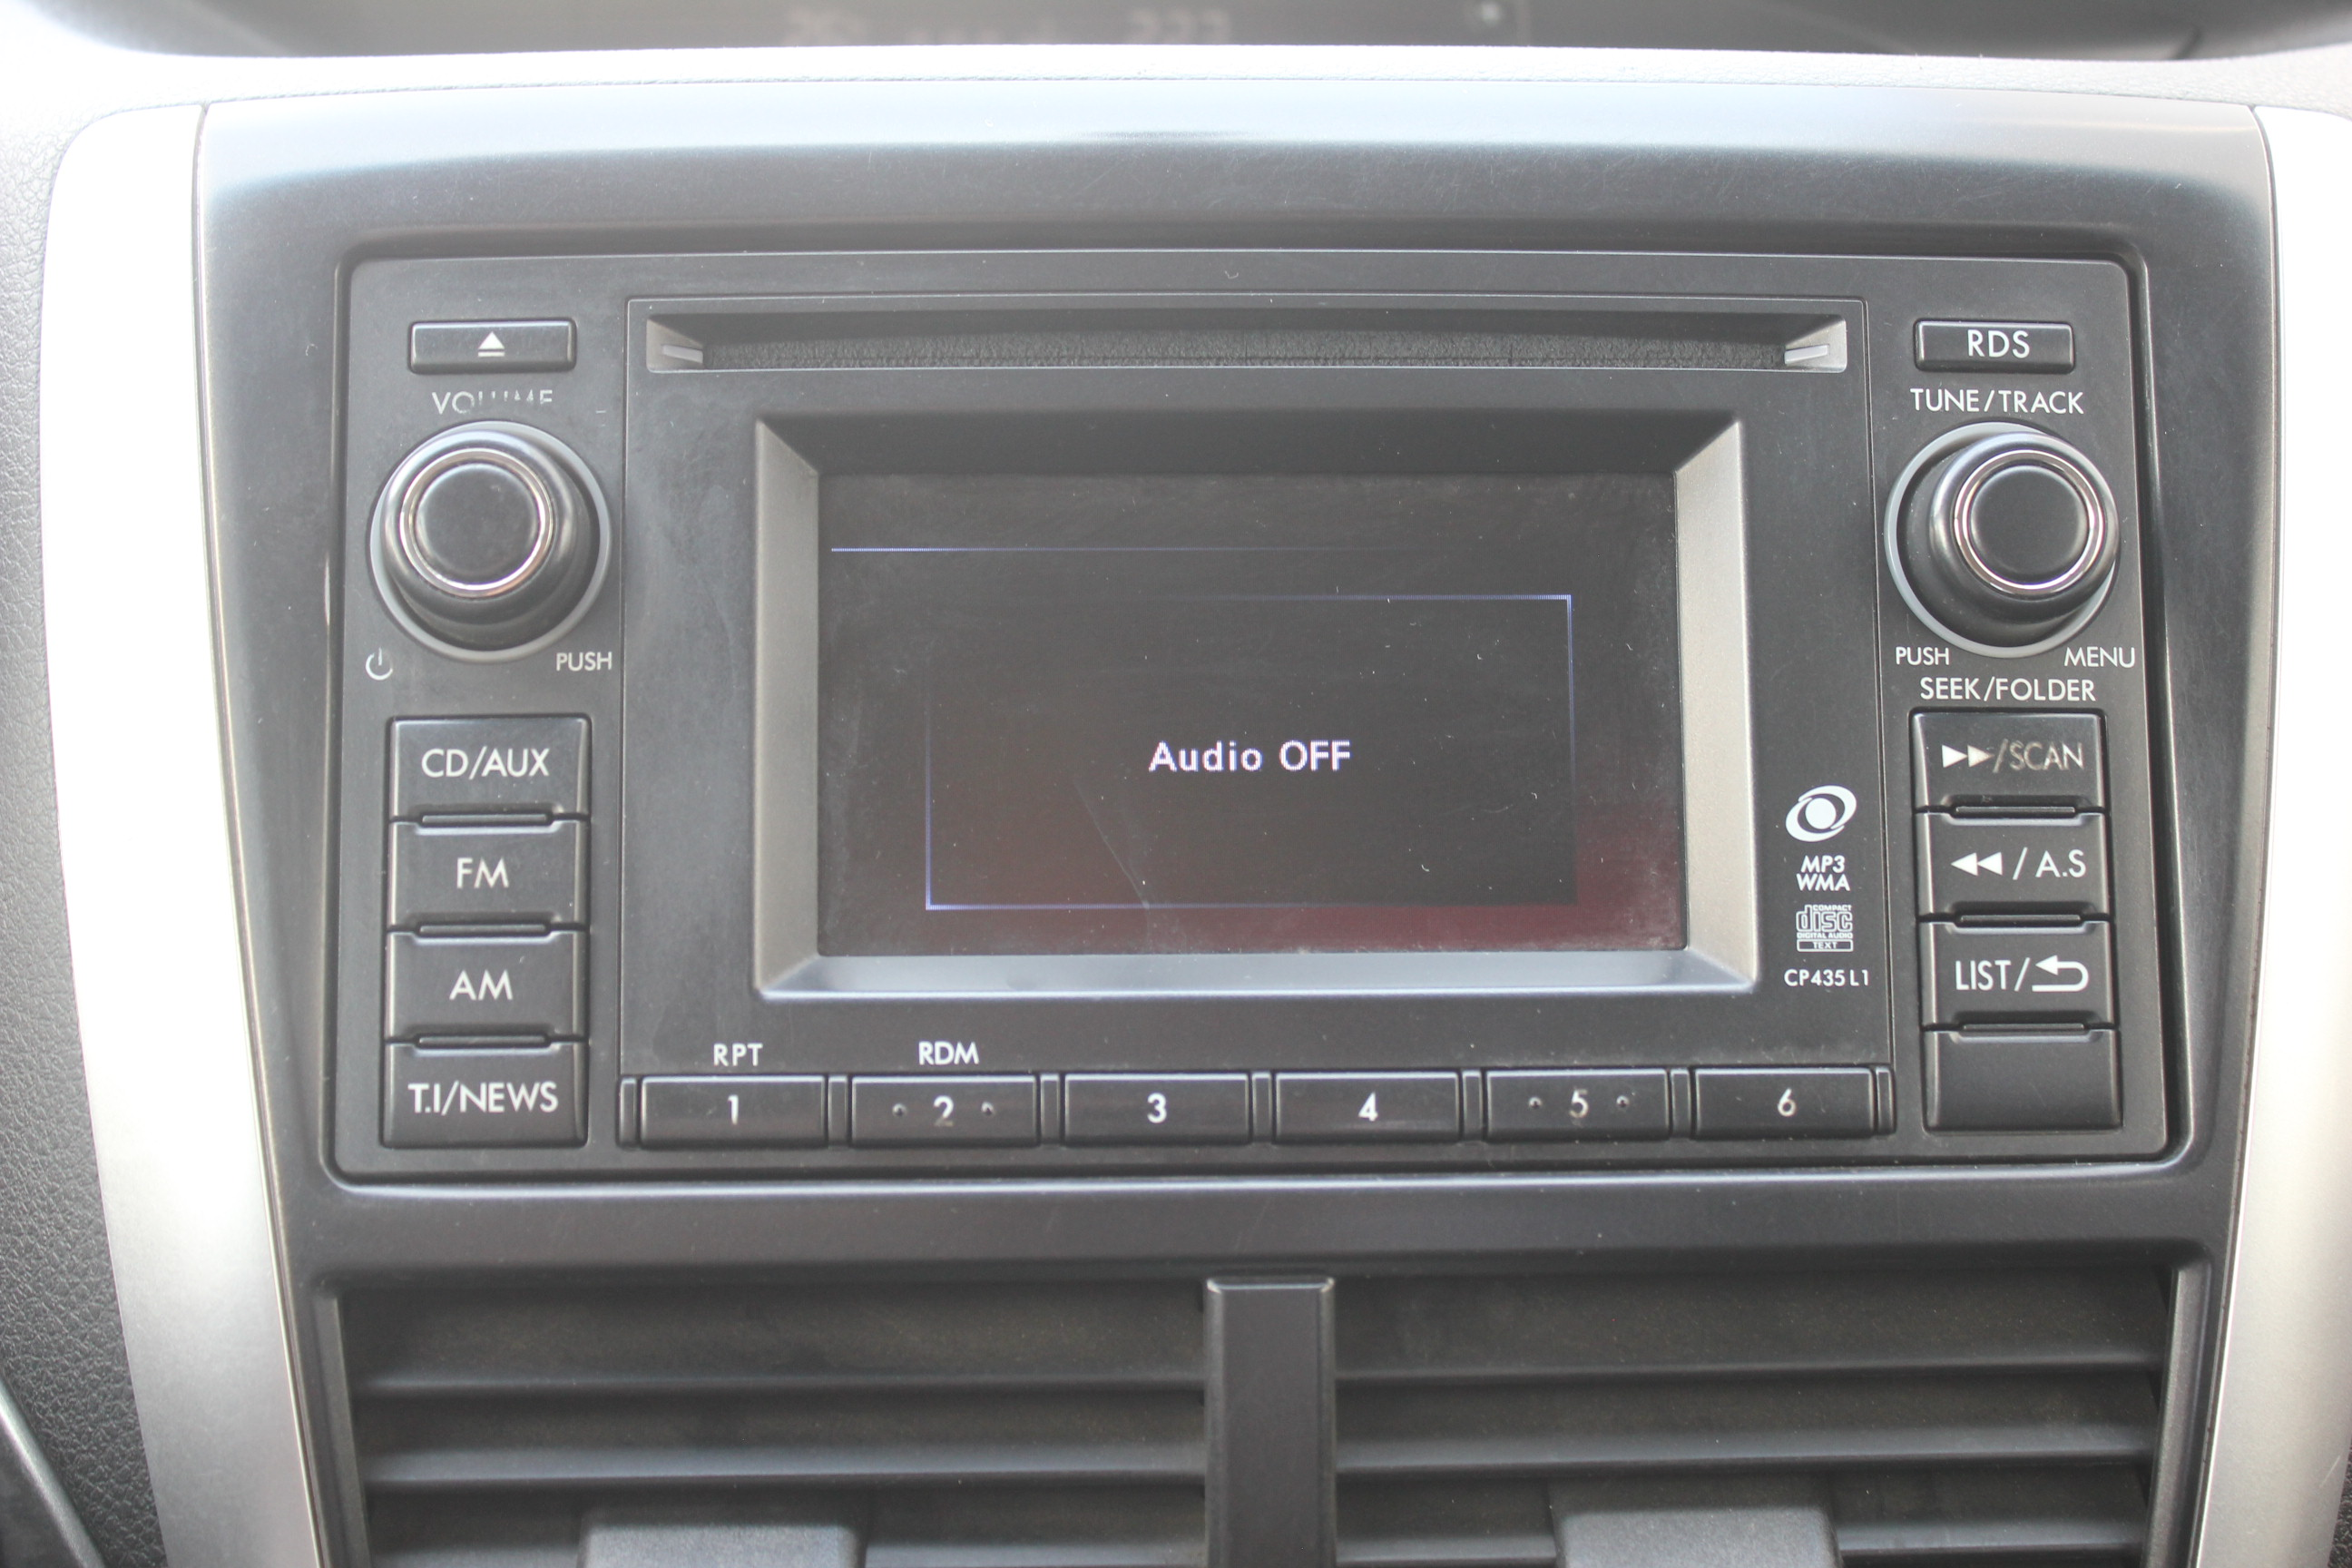 Subaru Forester Внедорожник (2011г.)